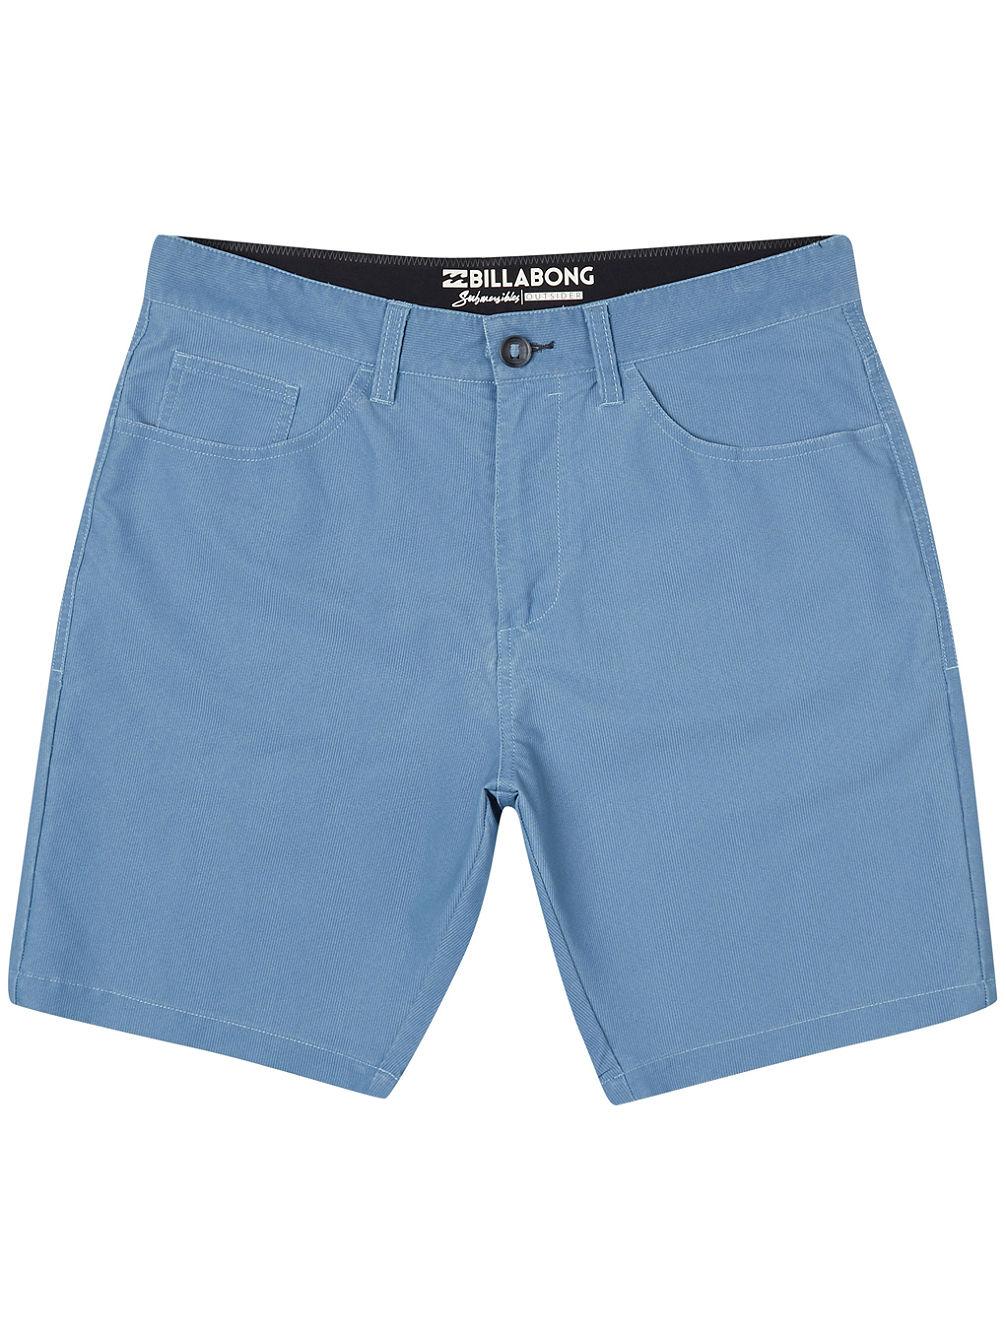 Buy Billabong Outsider X Surf Cord Shorts online at blue-tomato.com 825ef8666b